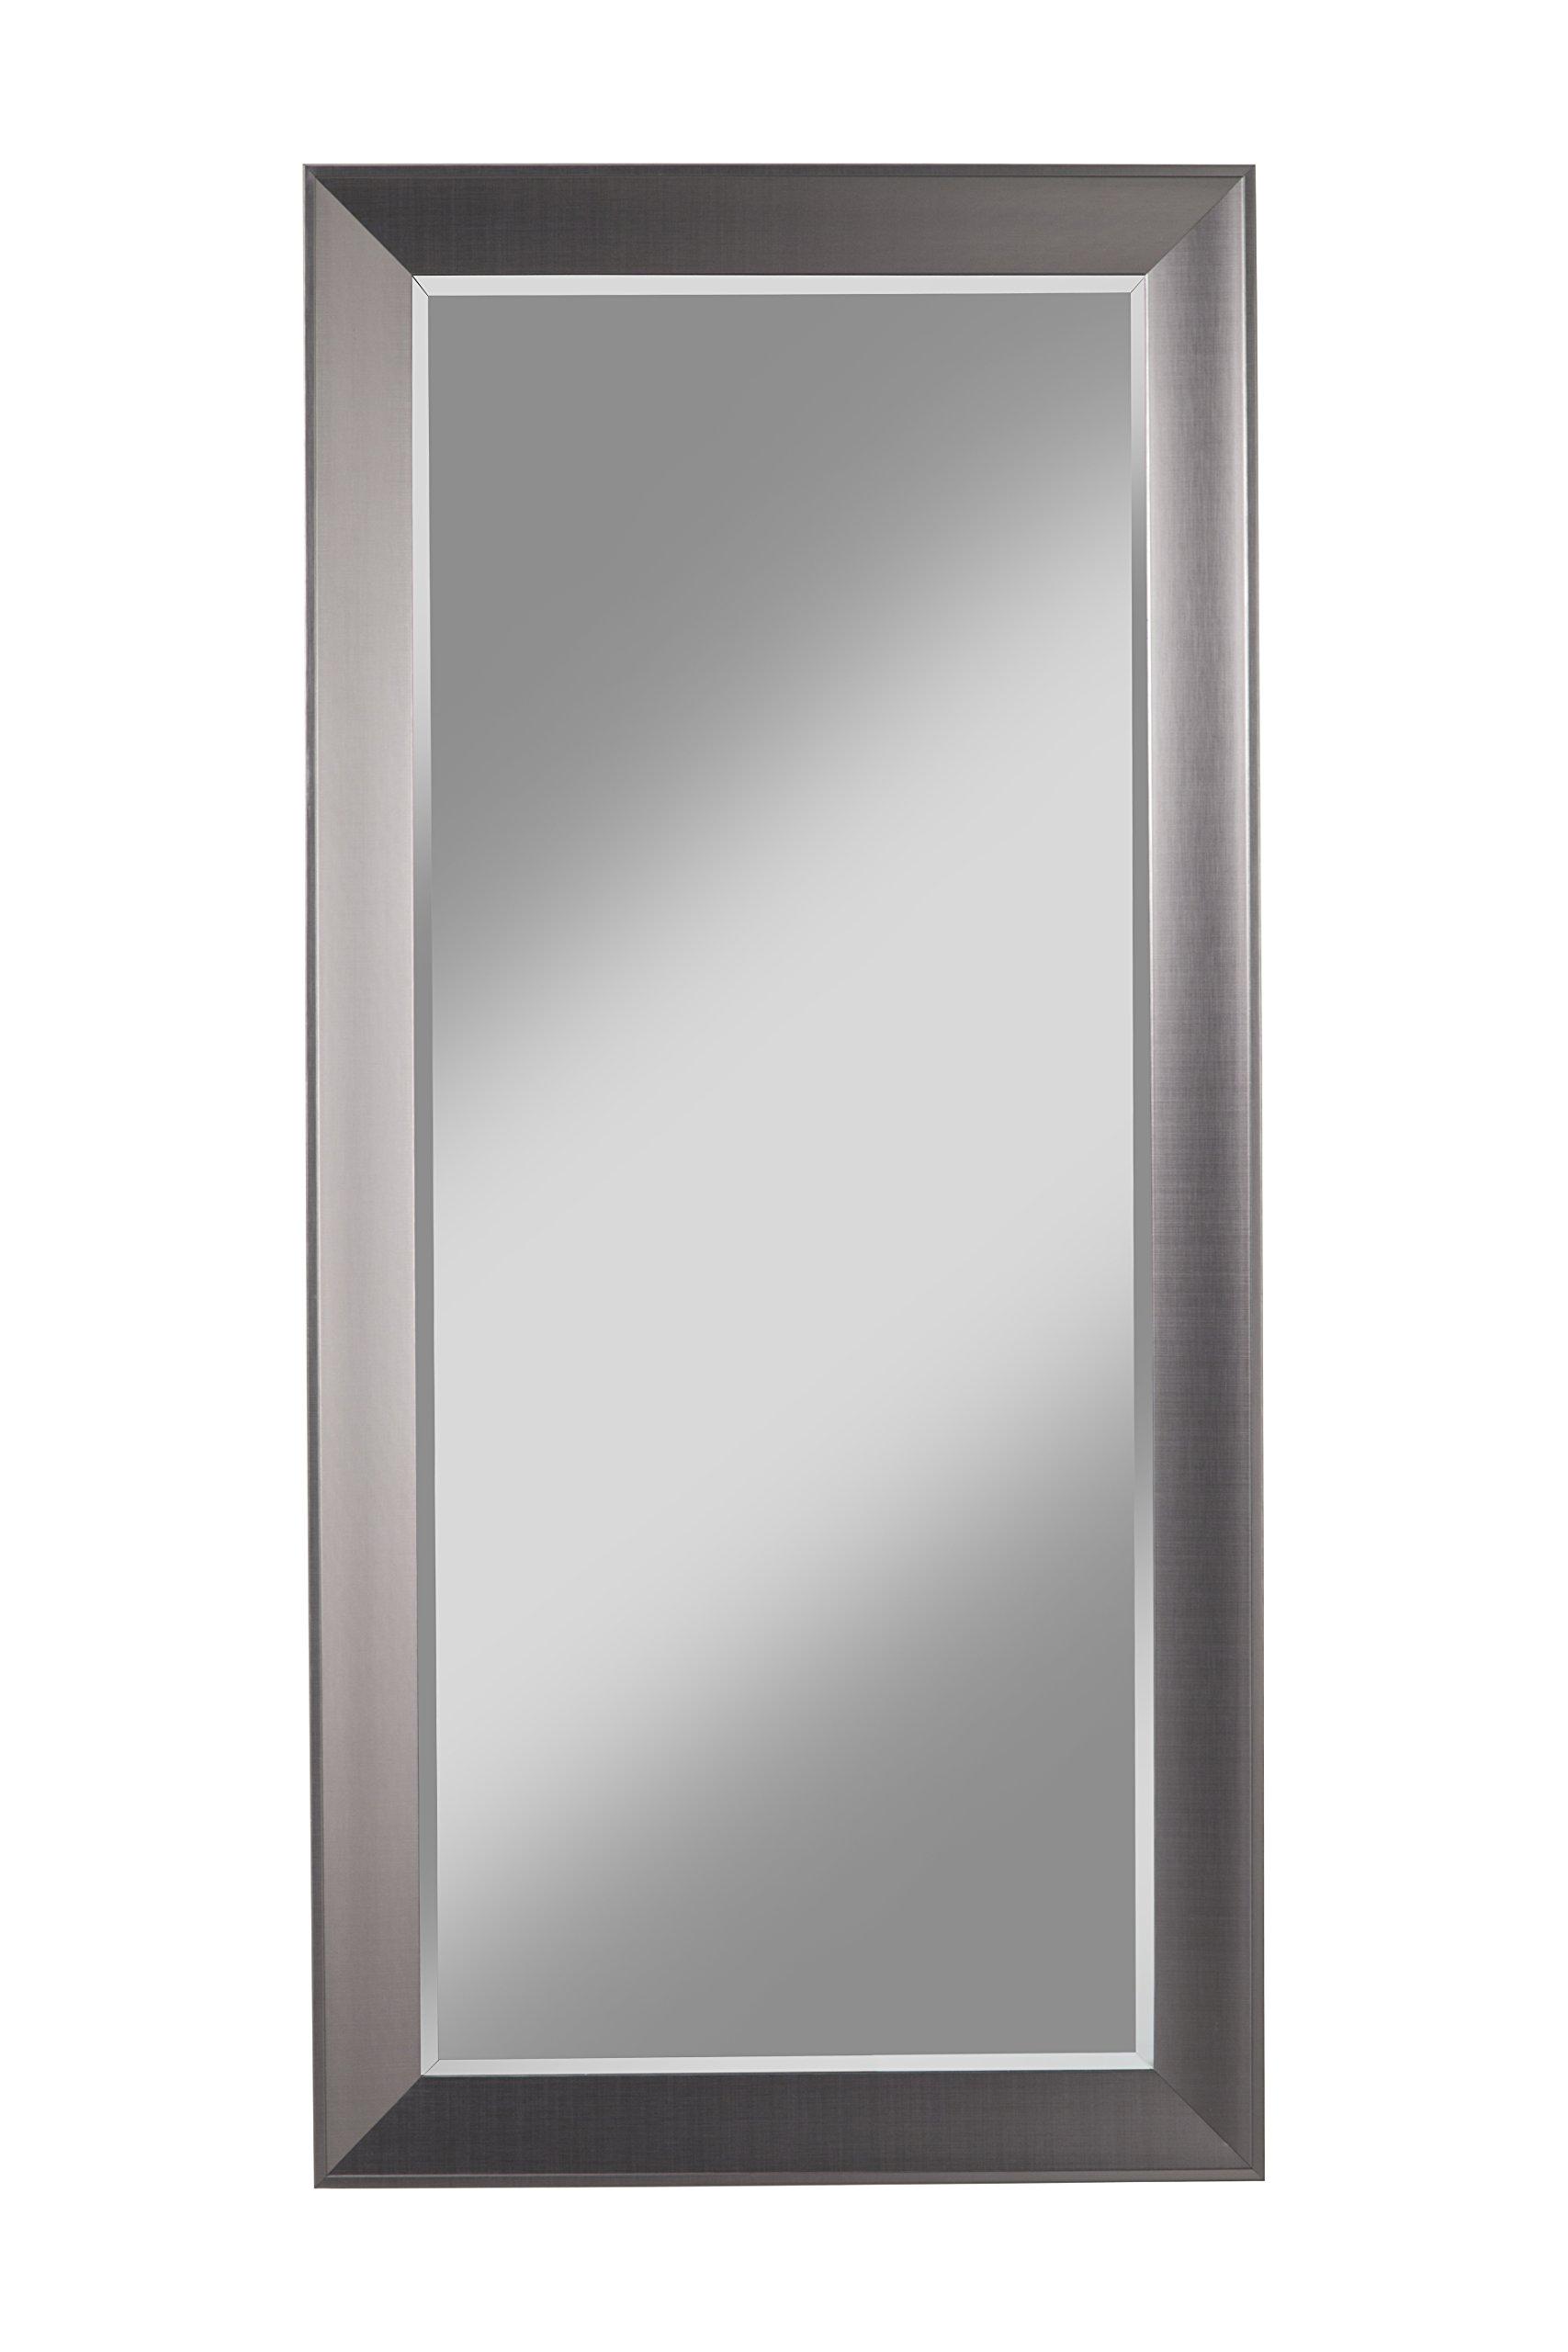 Sandberg Furniture 15311 Contemporary Silver Full Length Leaner Mirror by Sandberg Furniture